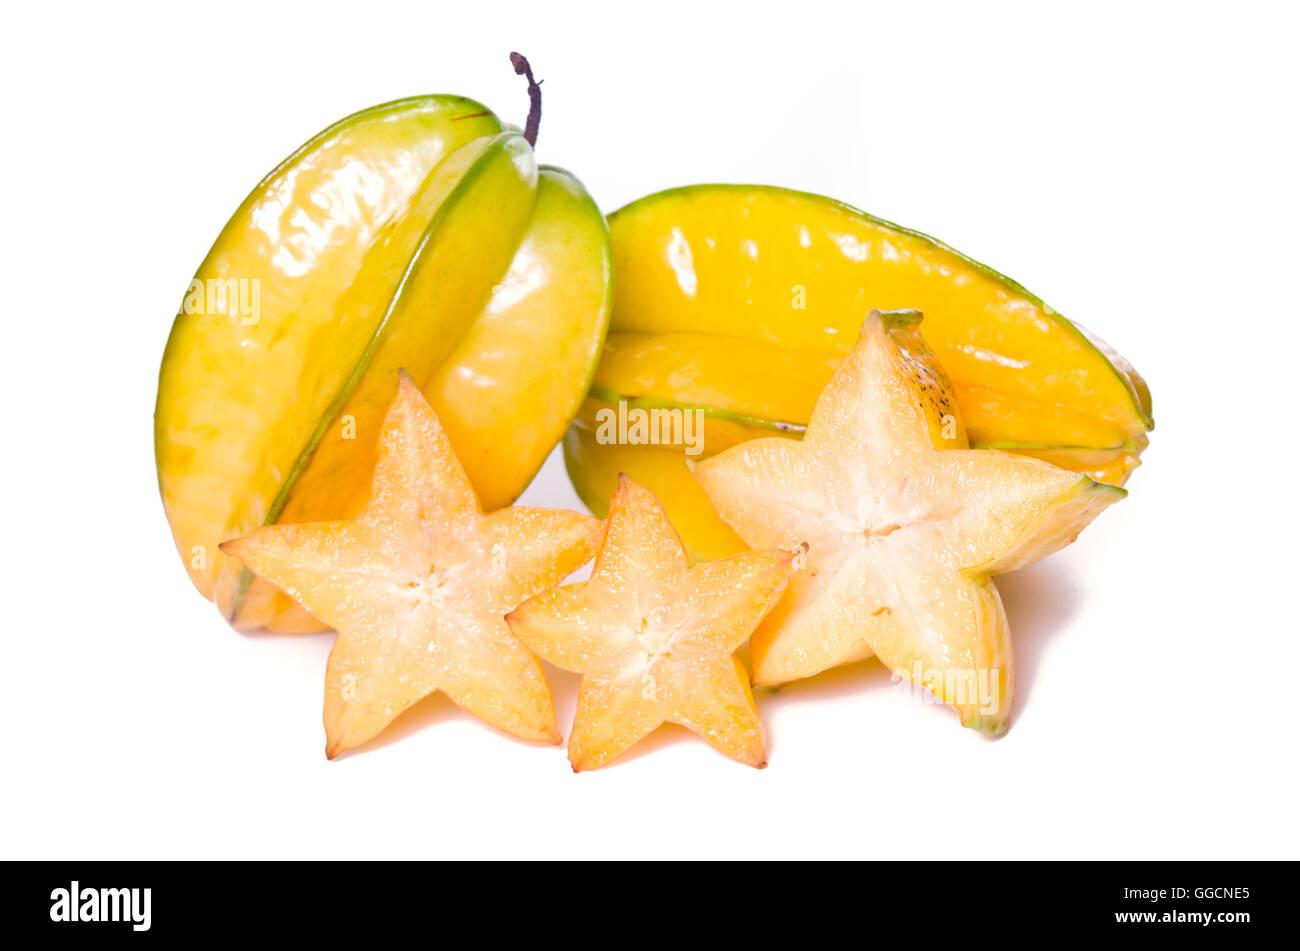 Star apple fruit (Also called as Carambola, starfruit, Averrhoa carambola, Bilimbi, Arkin in Florida, Dah Pon, Ma - Stock Image